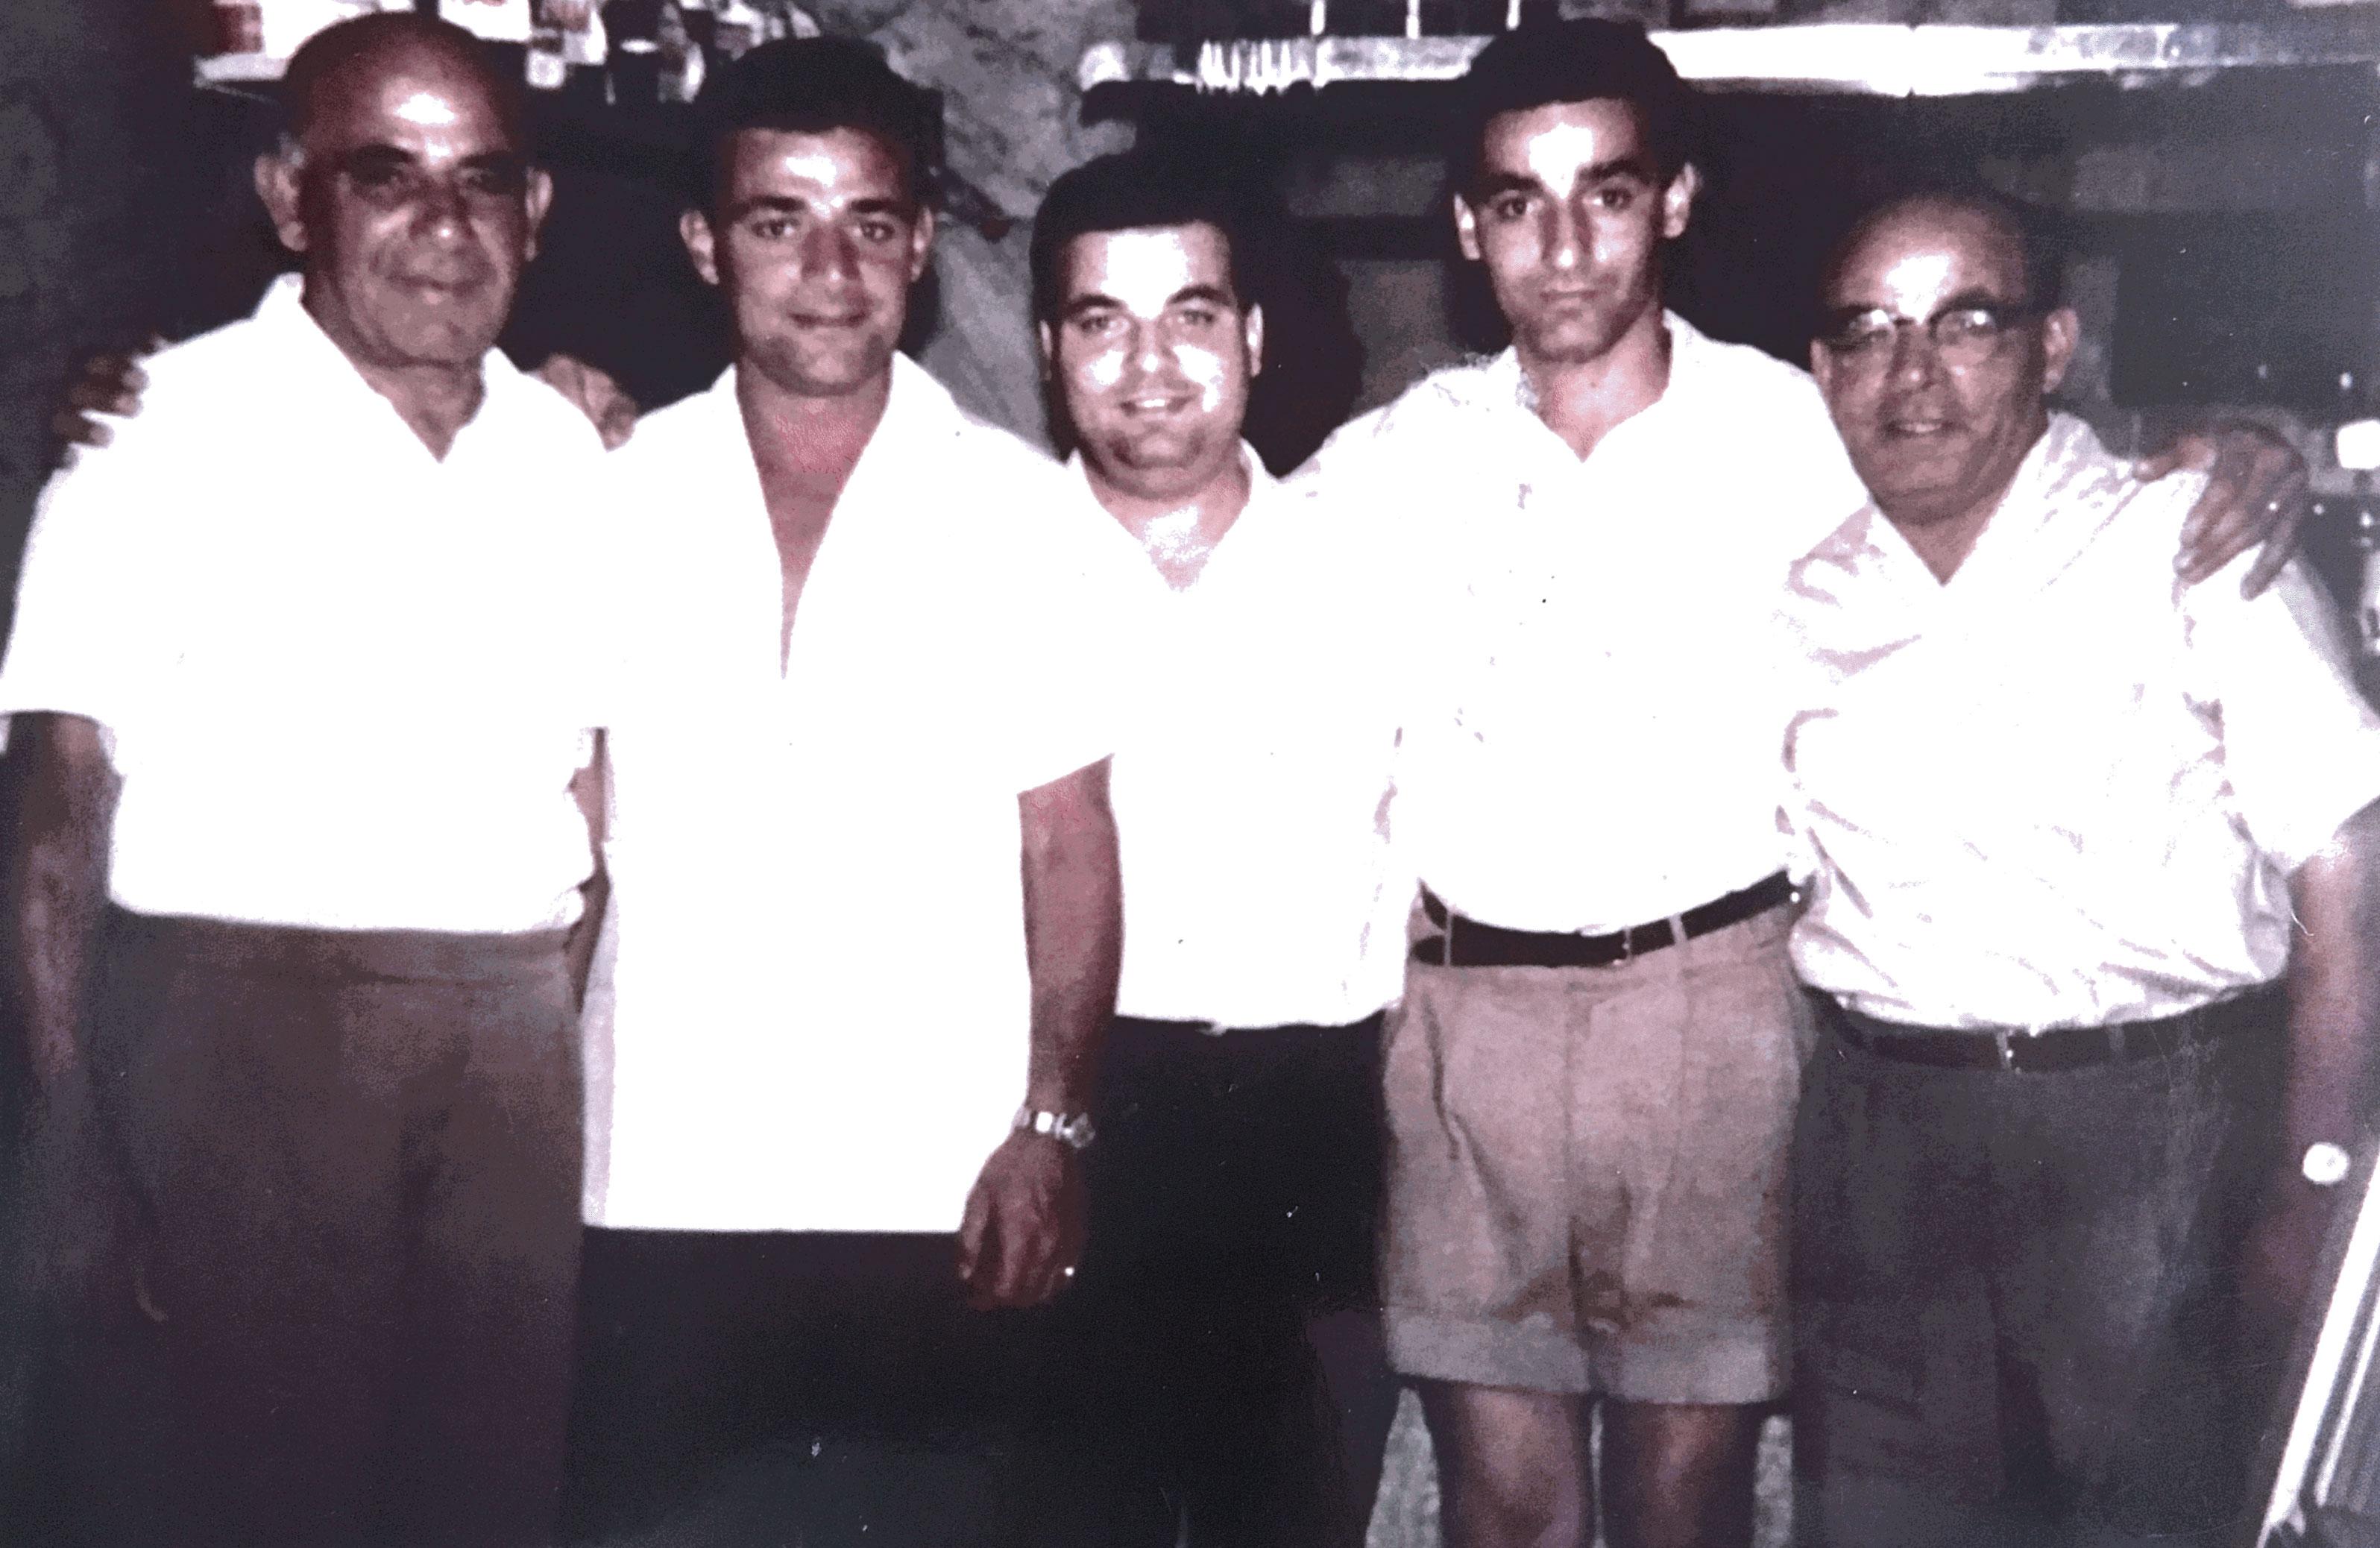 From left: Manuel Pisani, Robert Pisani, John Pisani, Charles Pisani and Anthony Pisani